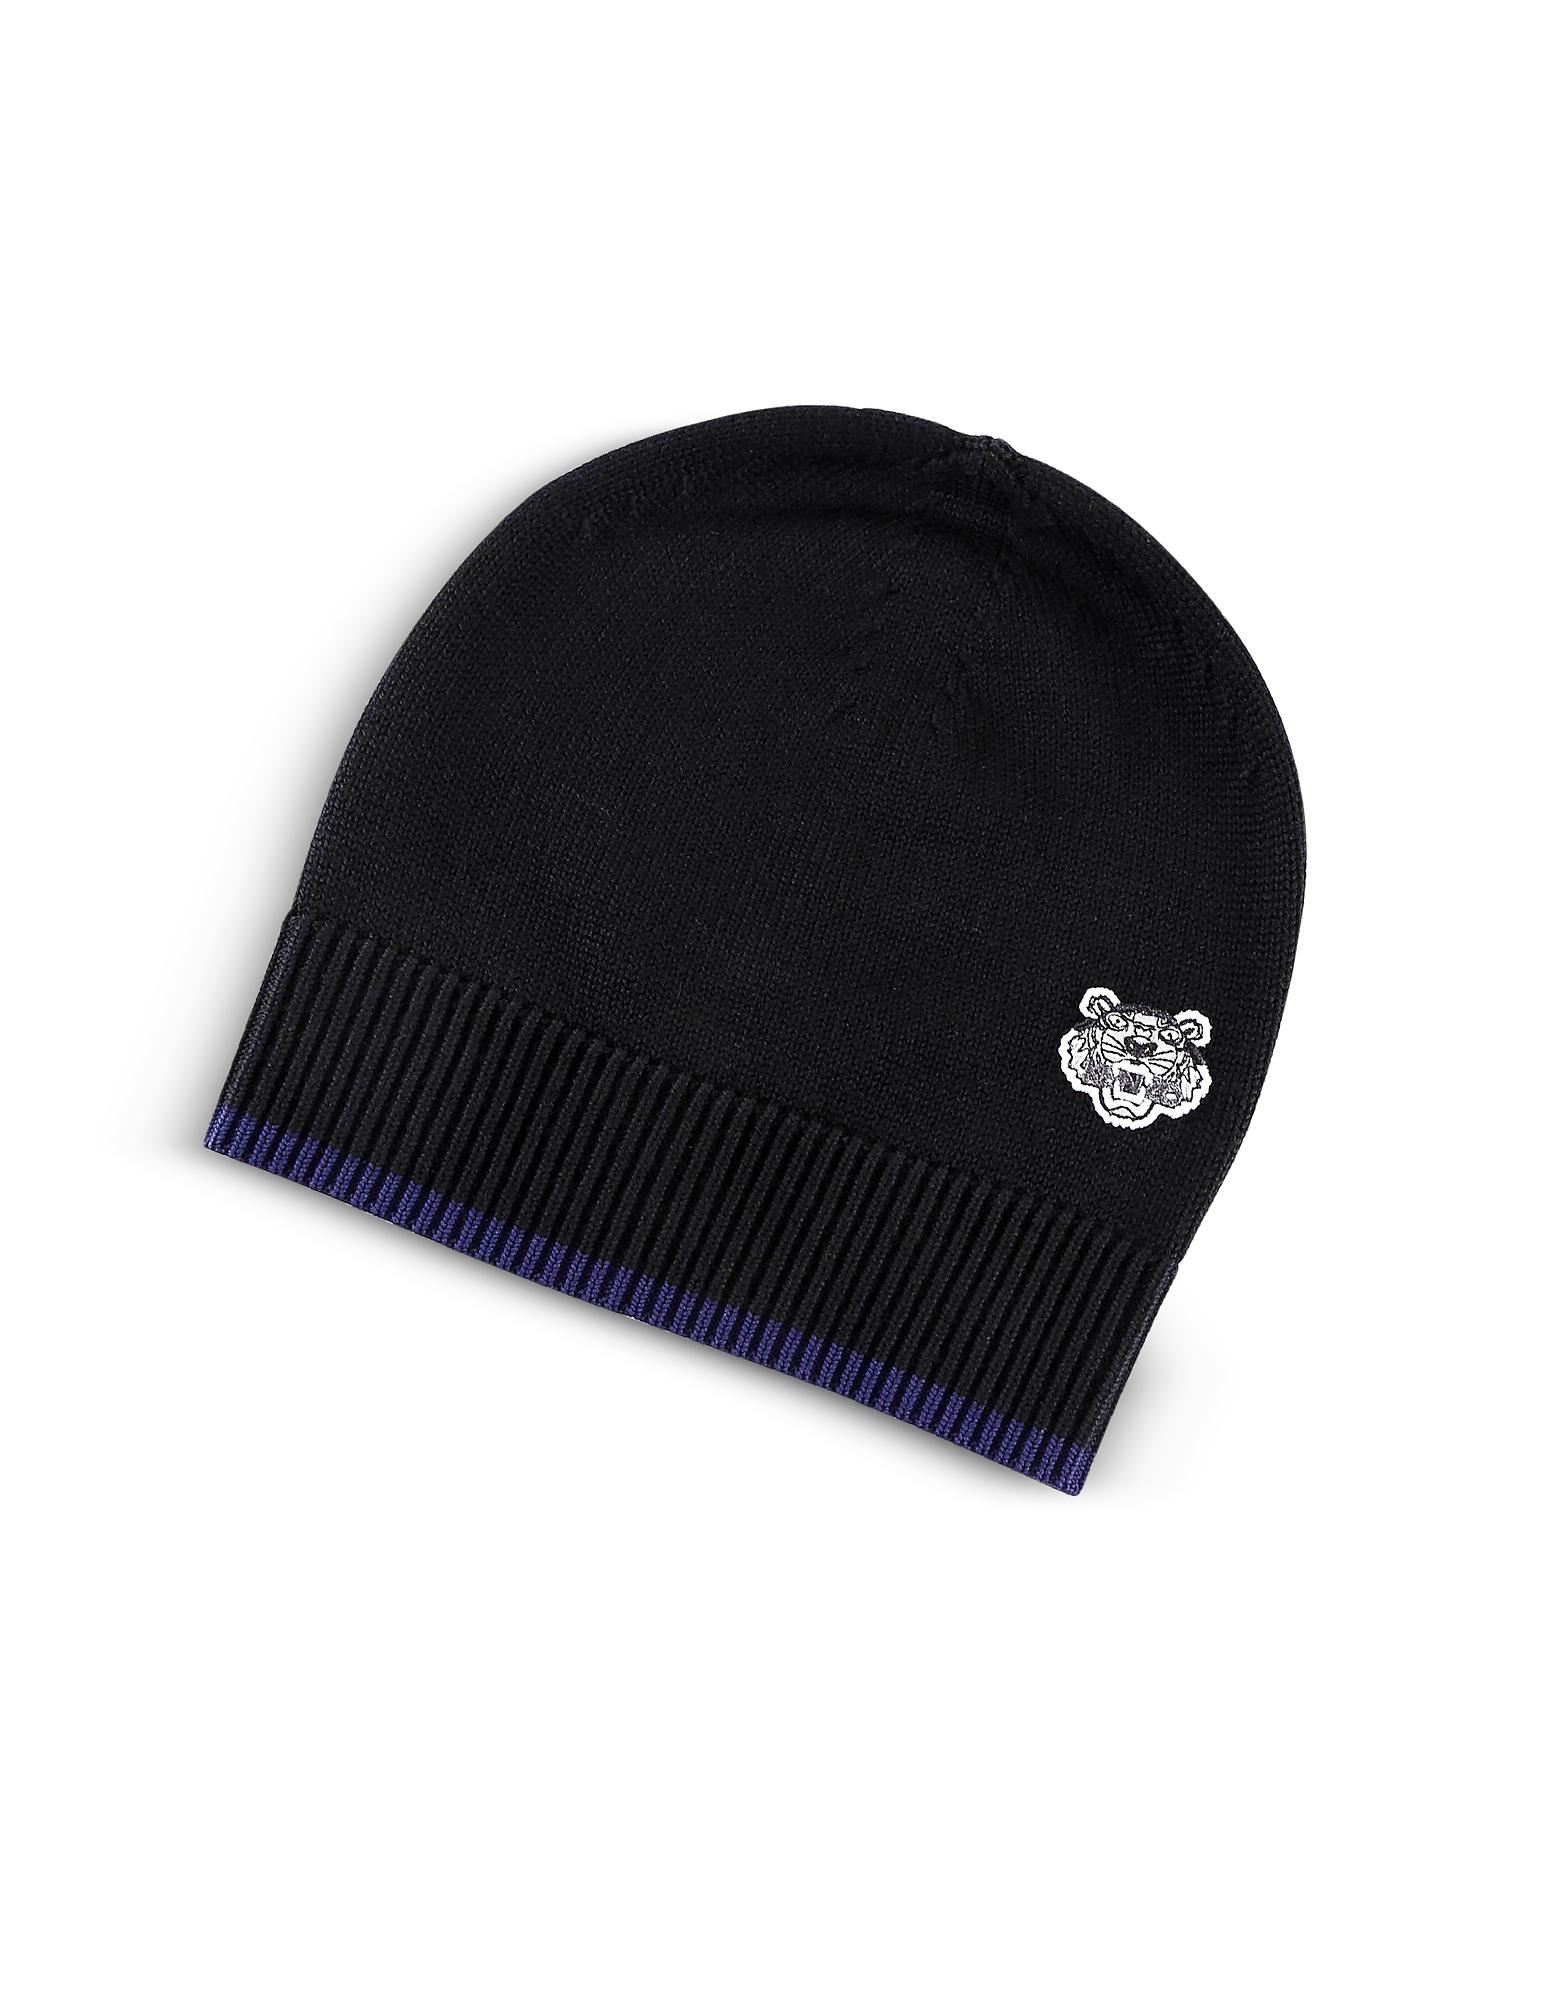 Image of Kenzo Designer Men's Hats, Wool Signature Tiger Crest Beanie